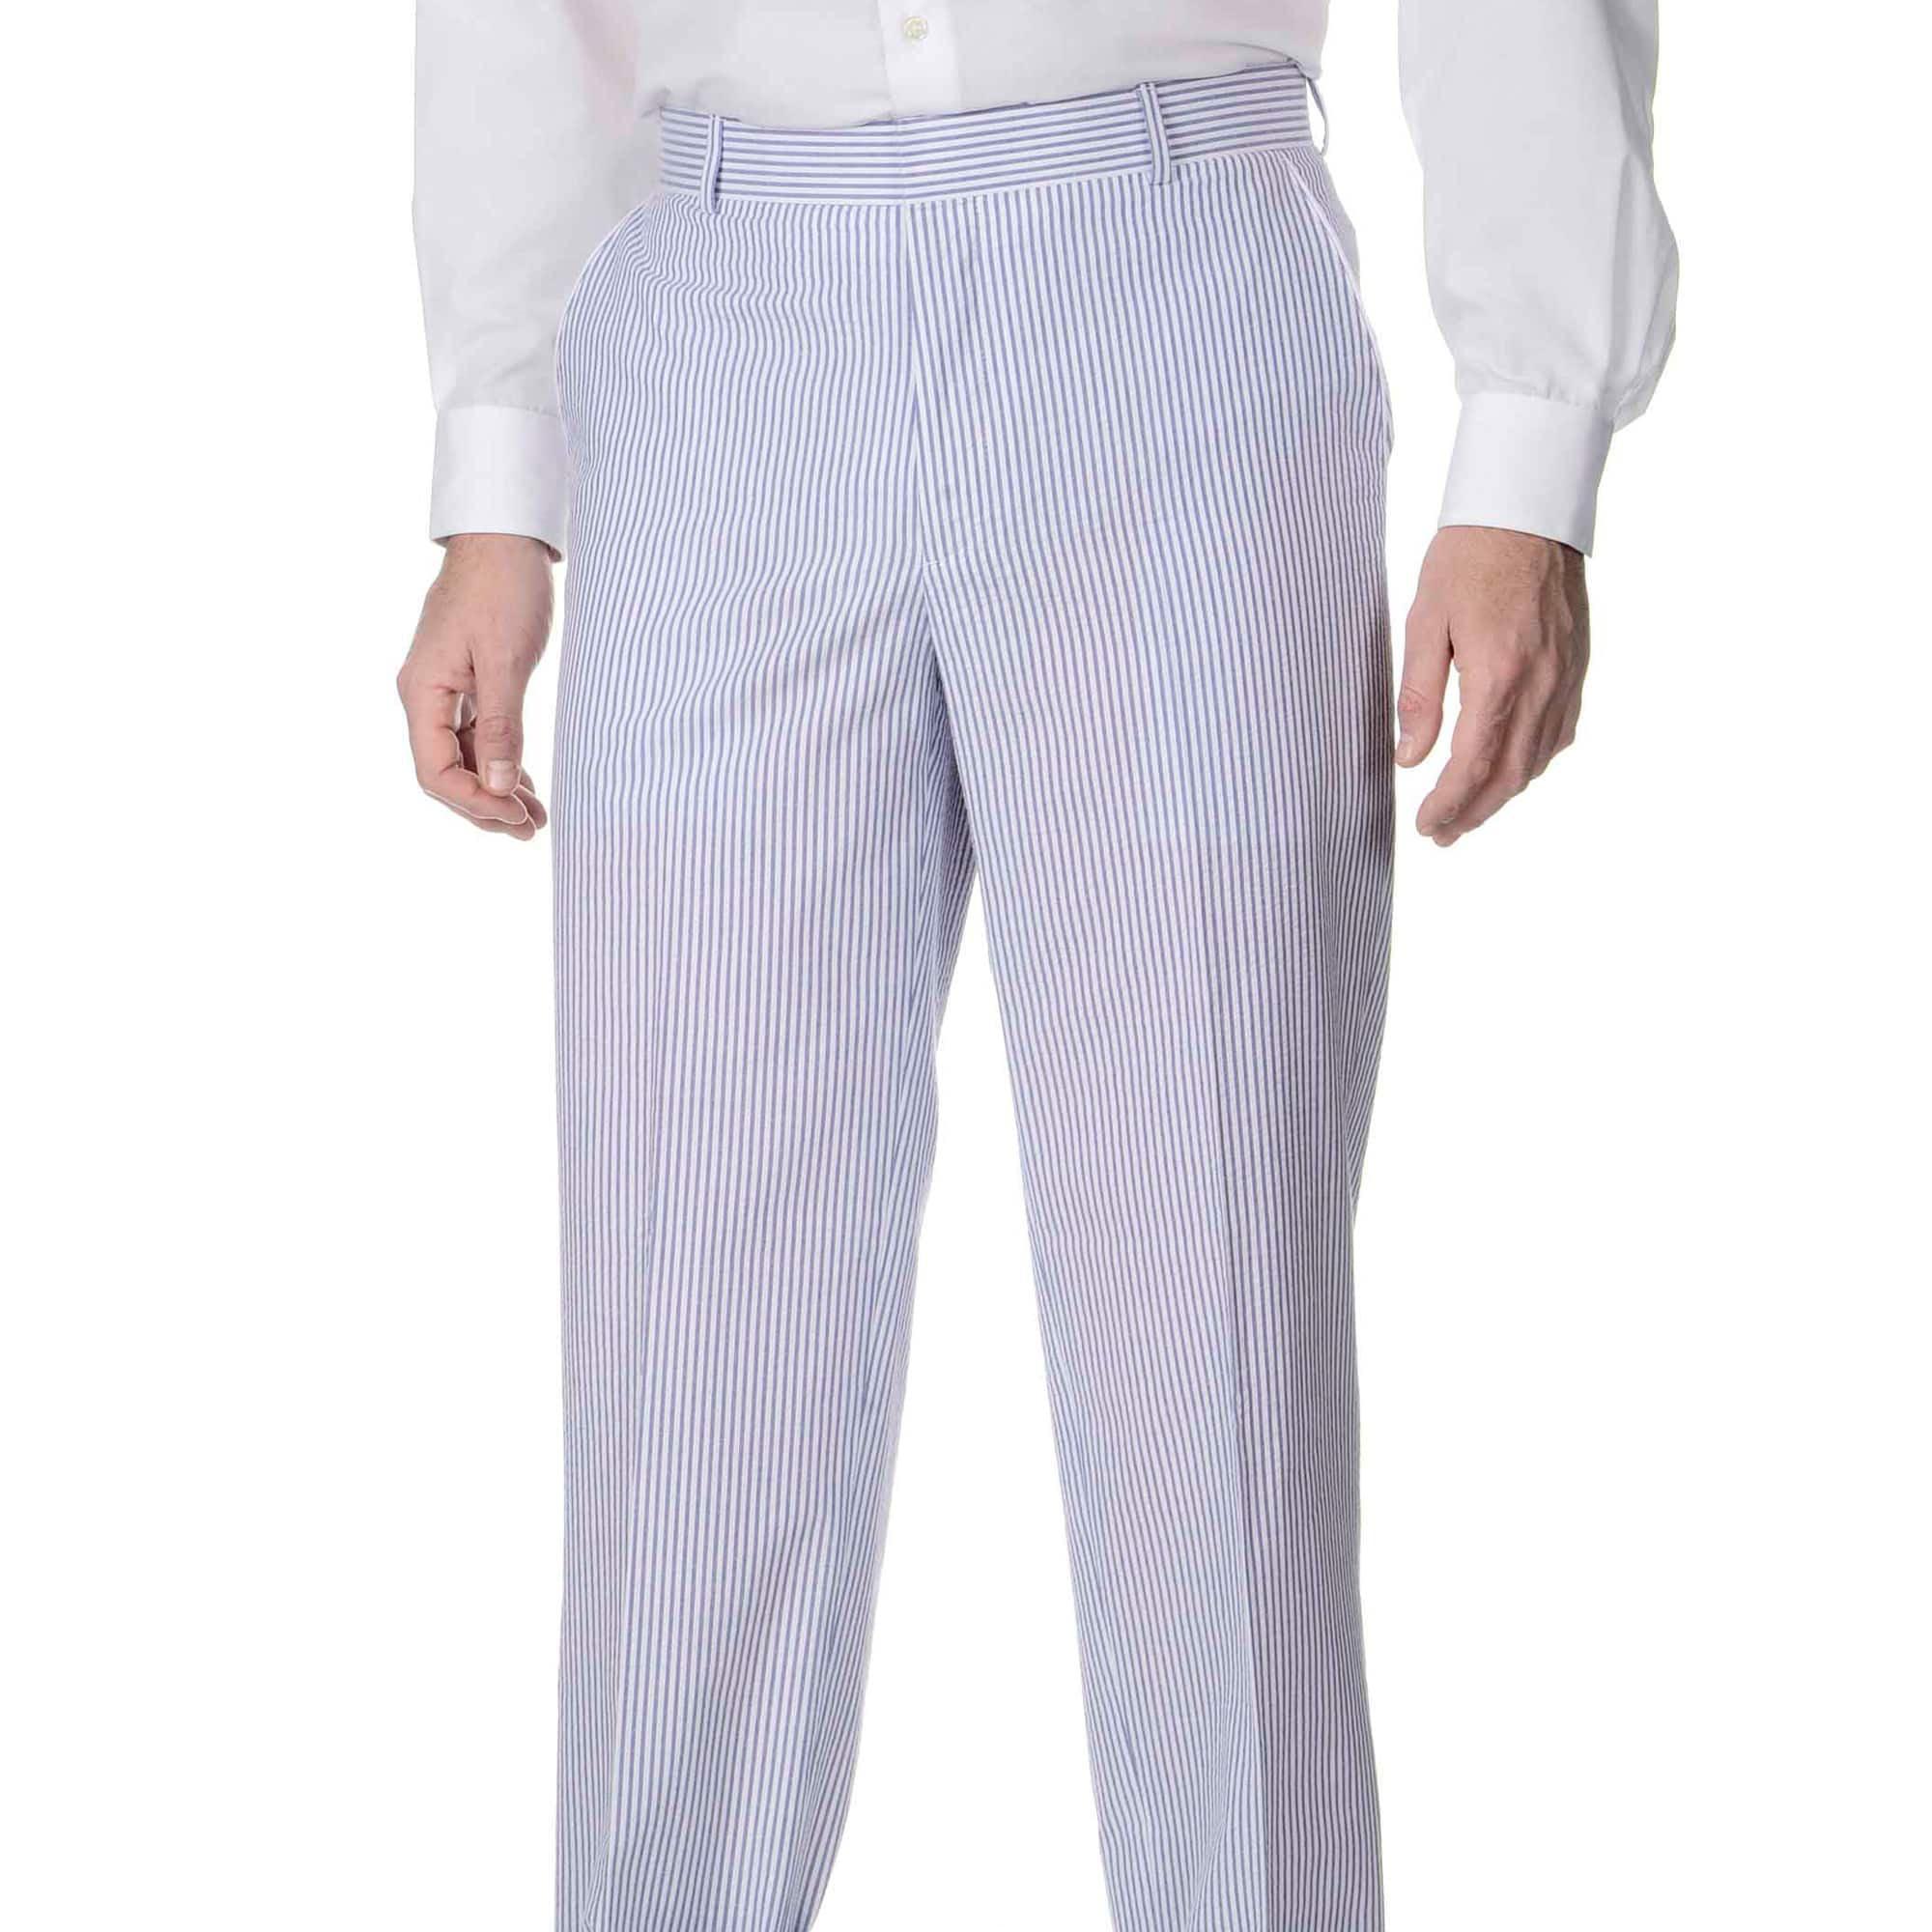 Palm Beach  Men's Big & Tall Flat Front Pant